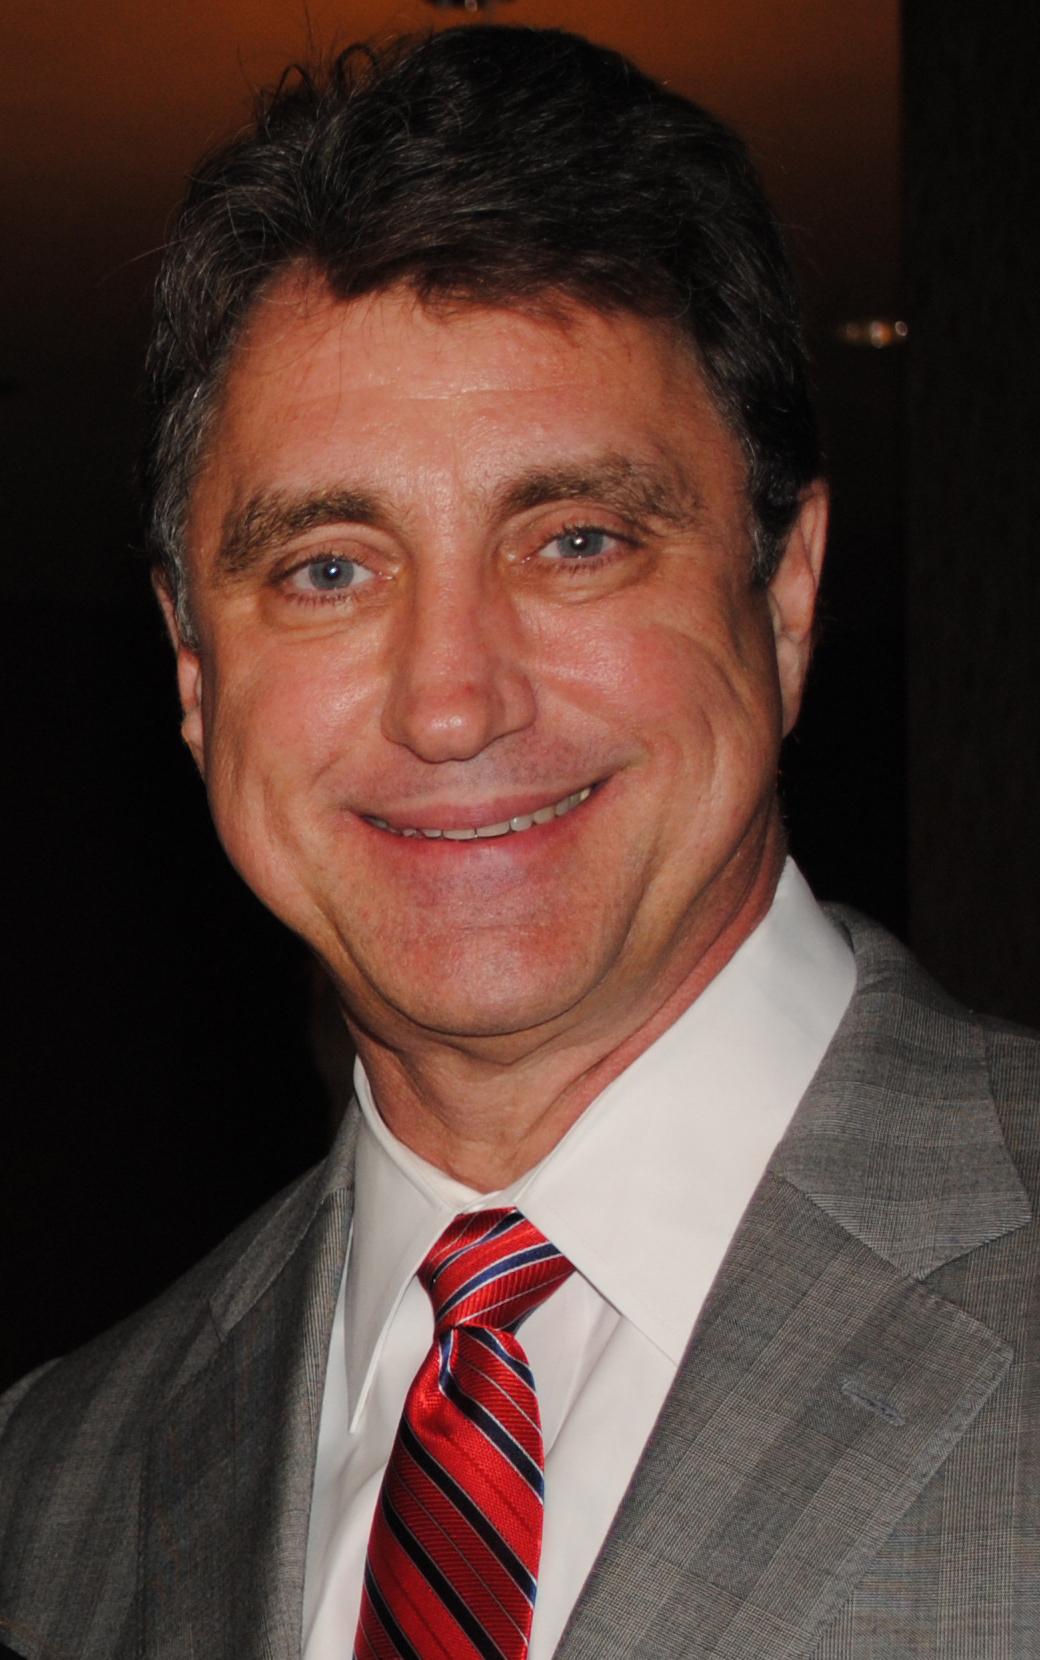 Mayor Glenn Royal